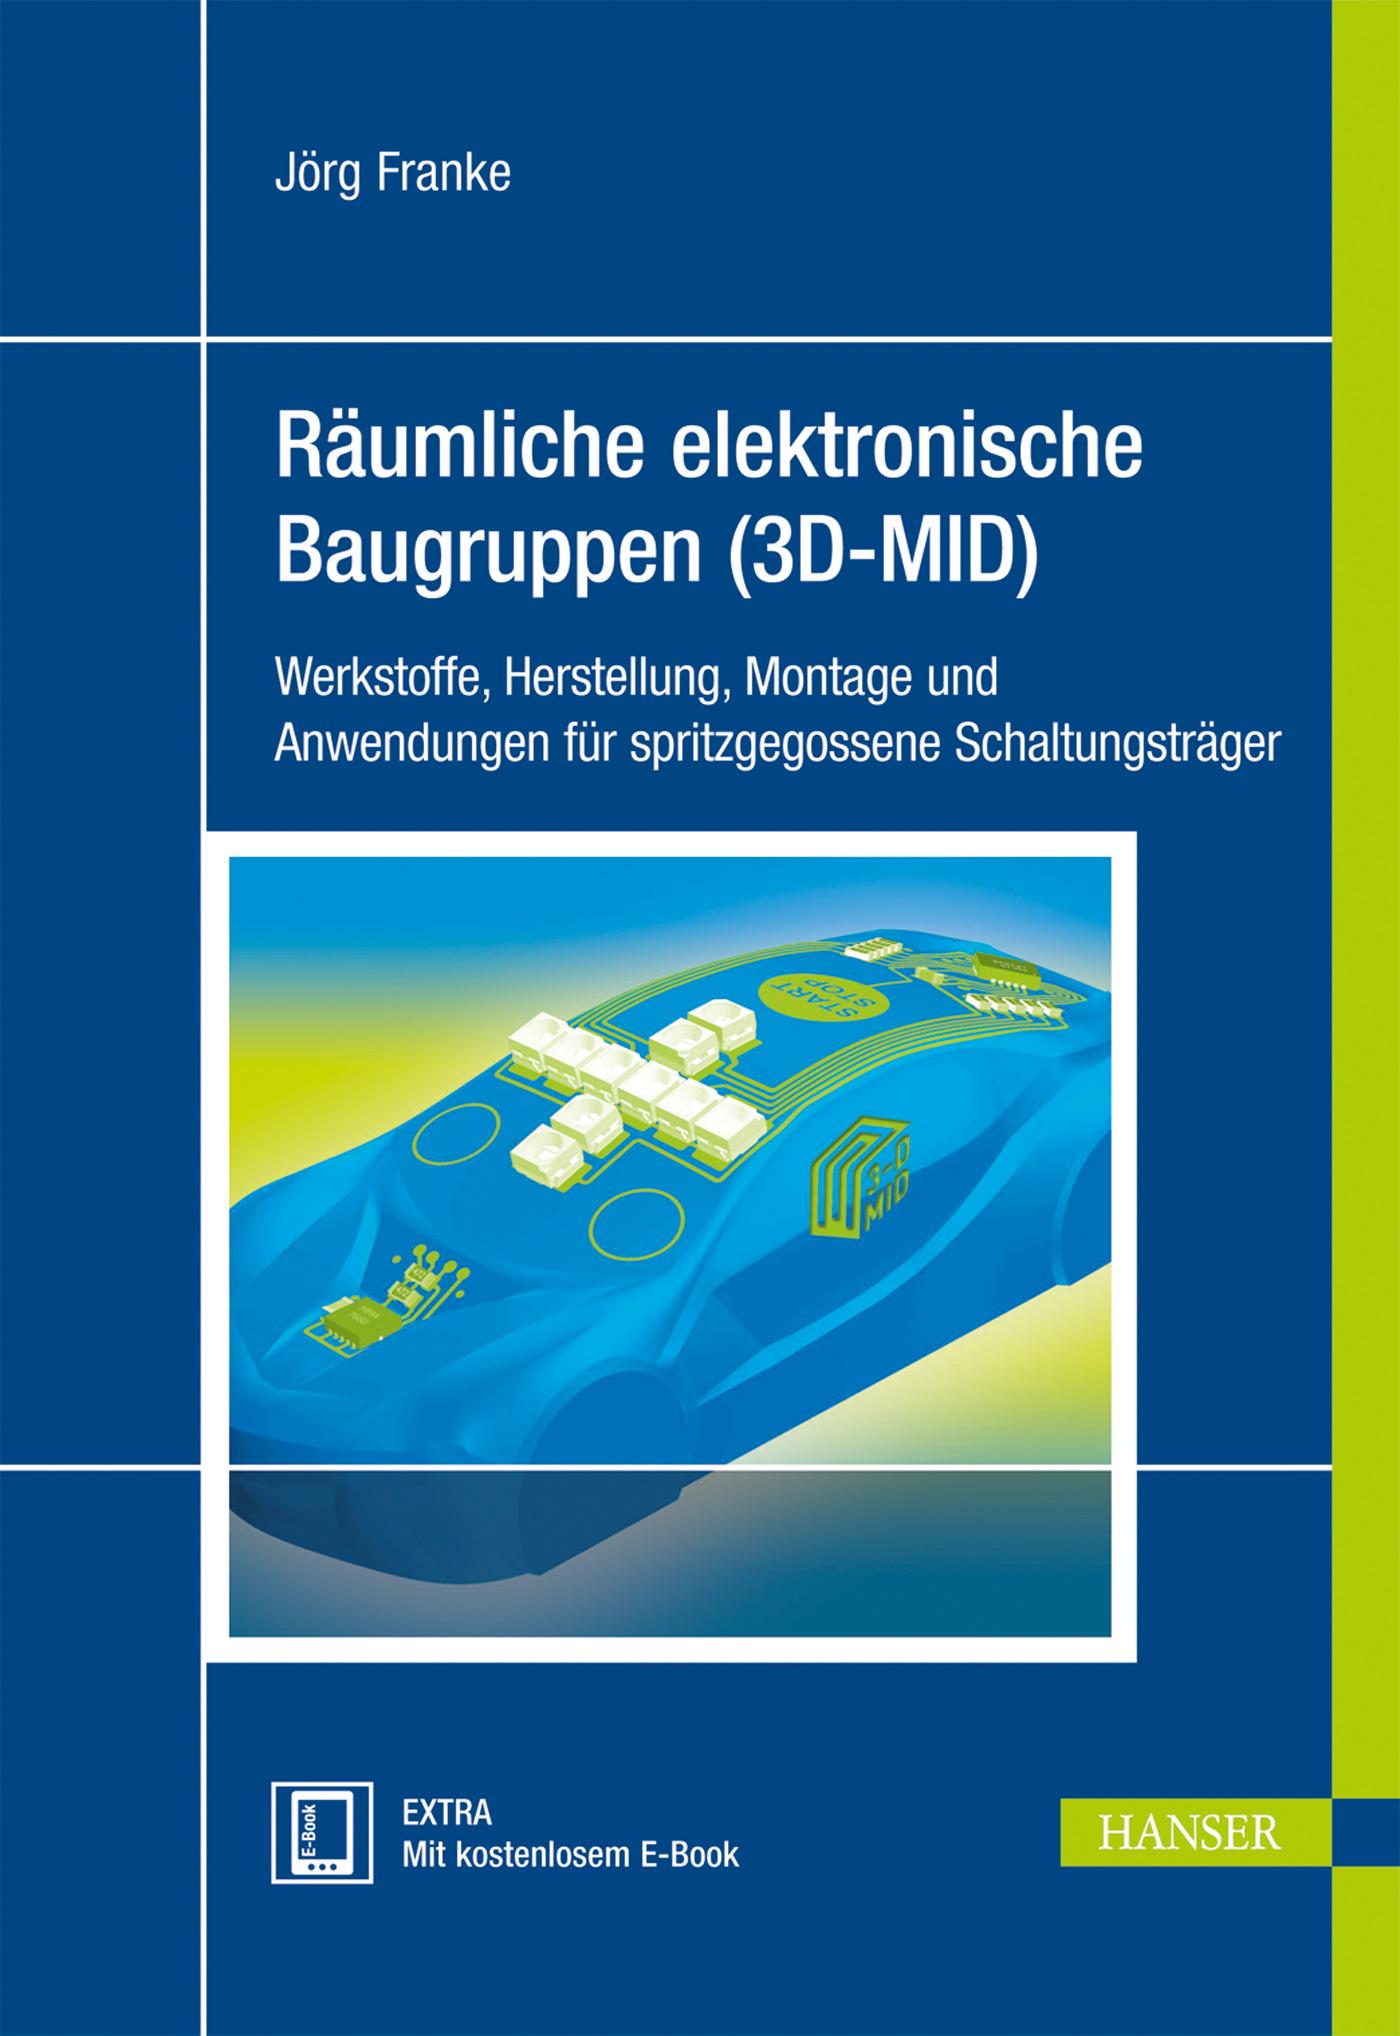 Räumliche elektronische Baugruppen (3D-MID), 978-3-446-43441-7